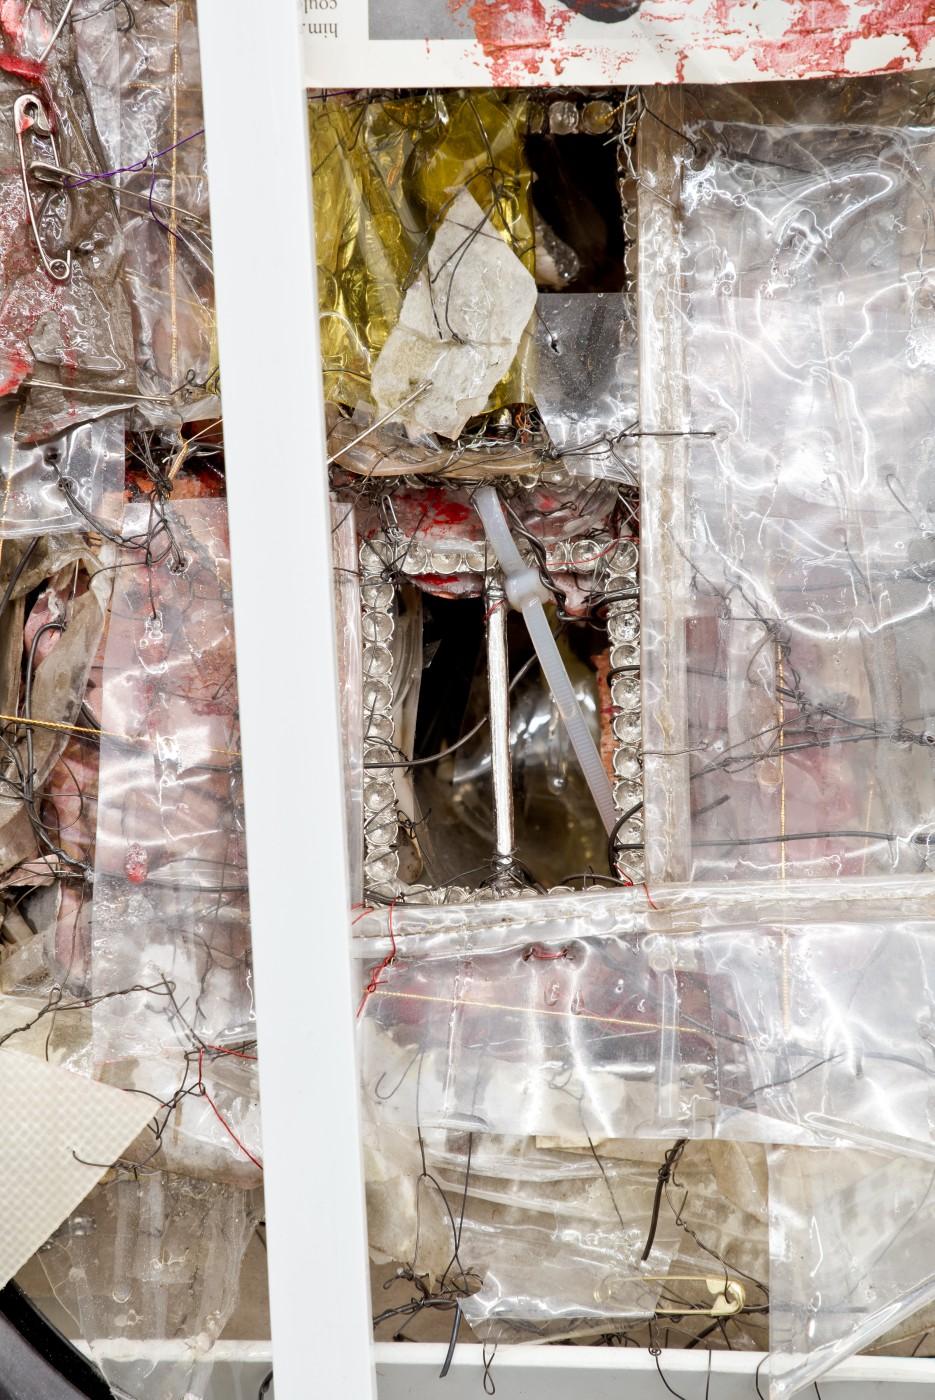 METROPOLITAN  Born Tactile</I>, 2015 (detail) Mixed media 79 x 48 x 44 cm / 31.1 x 18.9 x 17.3 in  ROBERT BITTENBENDER